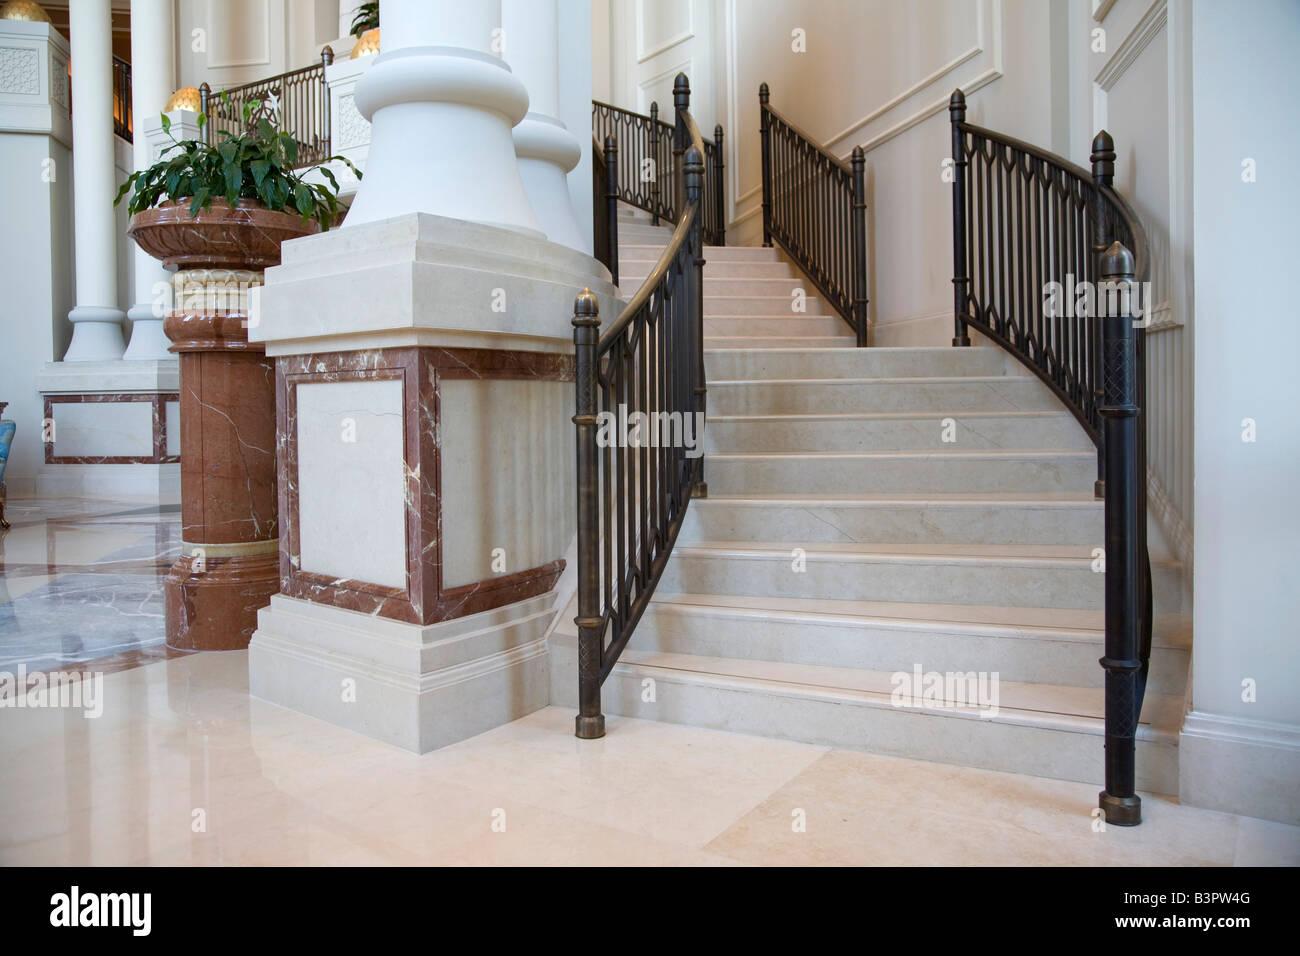 Four Seasons Hotel 5 Five Star Luxury Doha Qatar - Stock Image